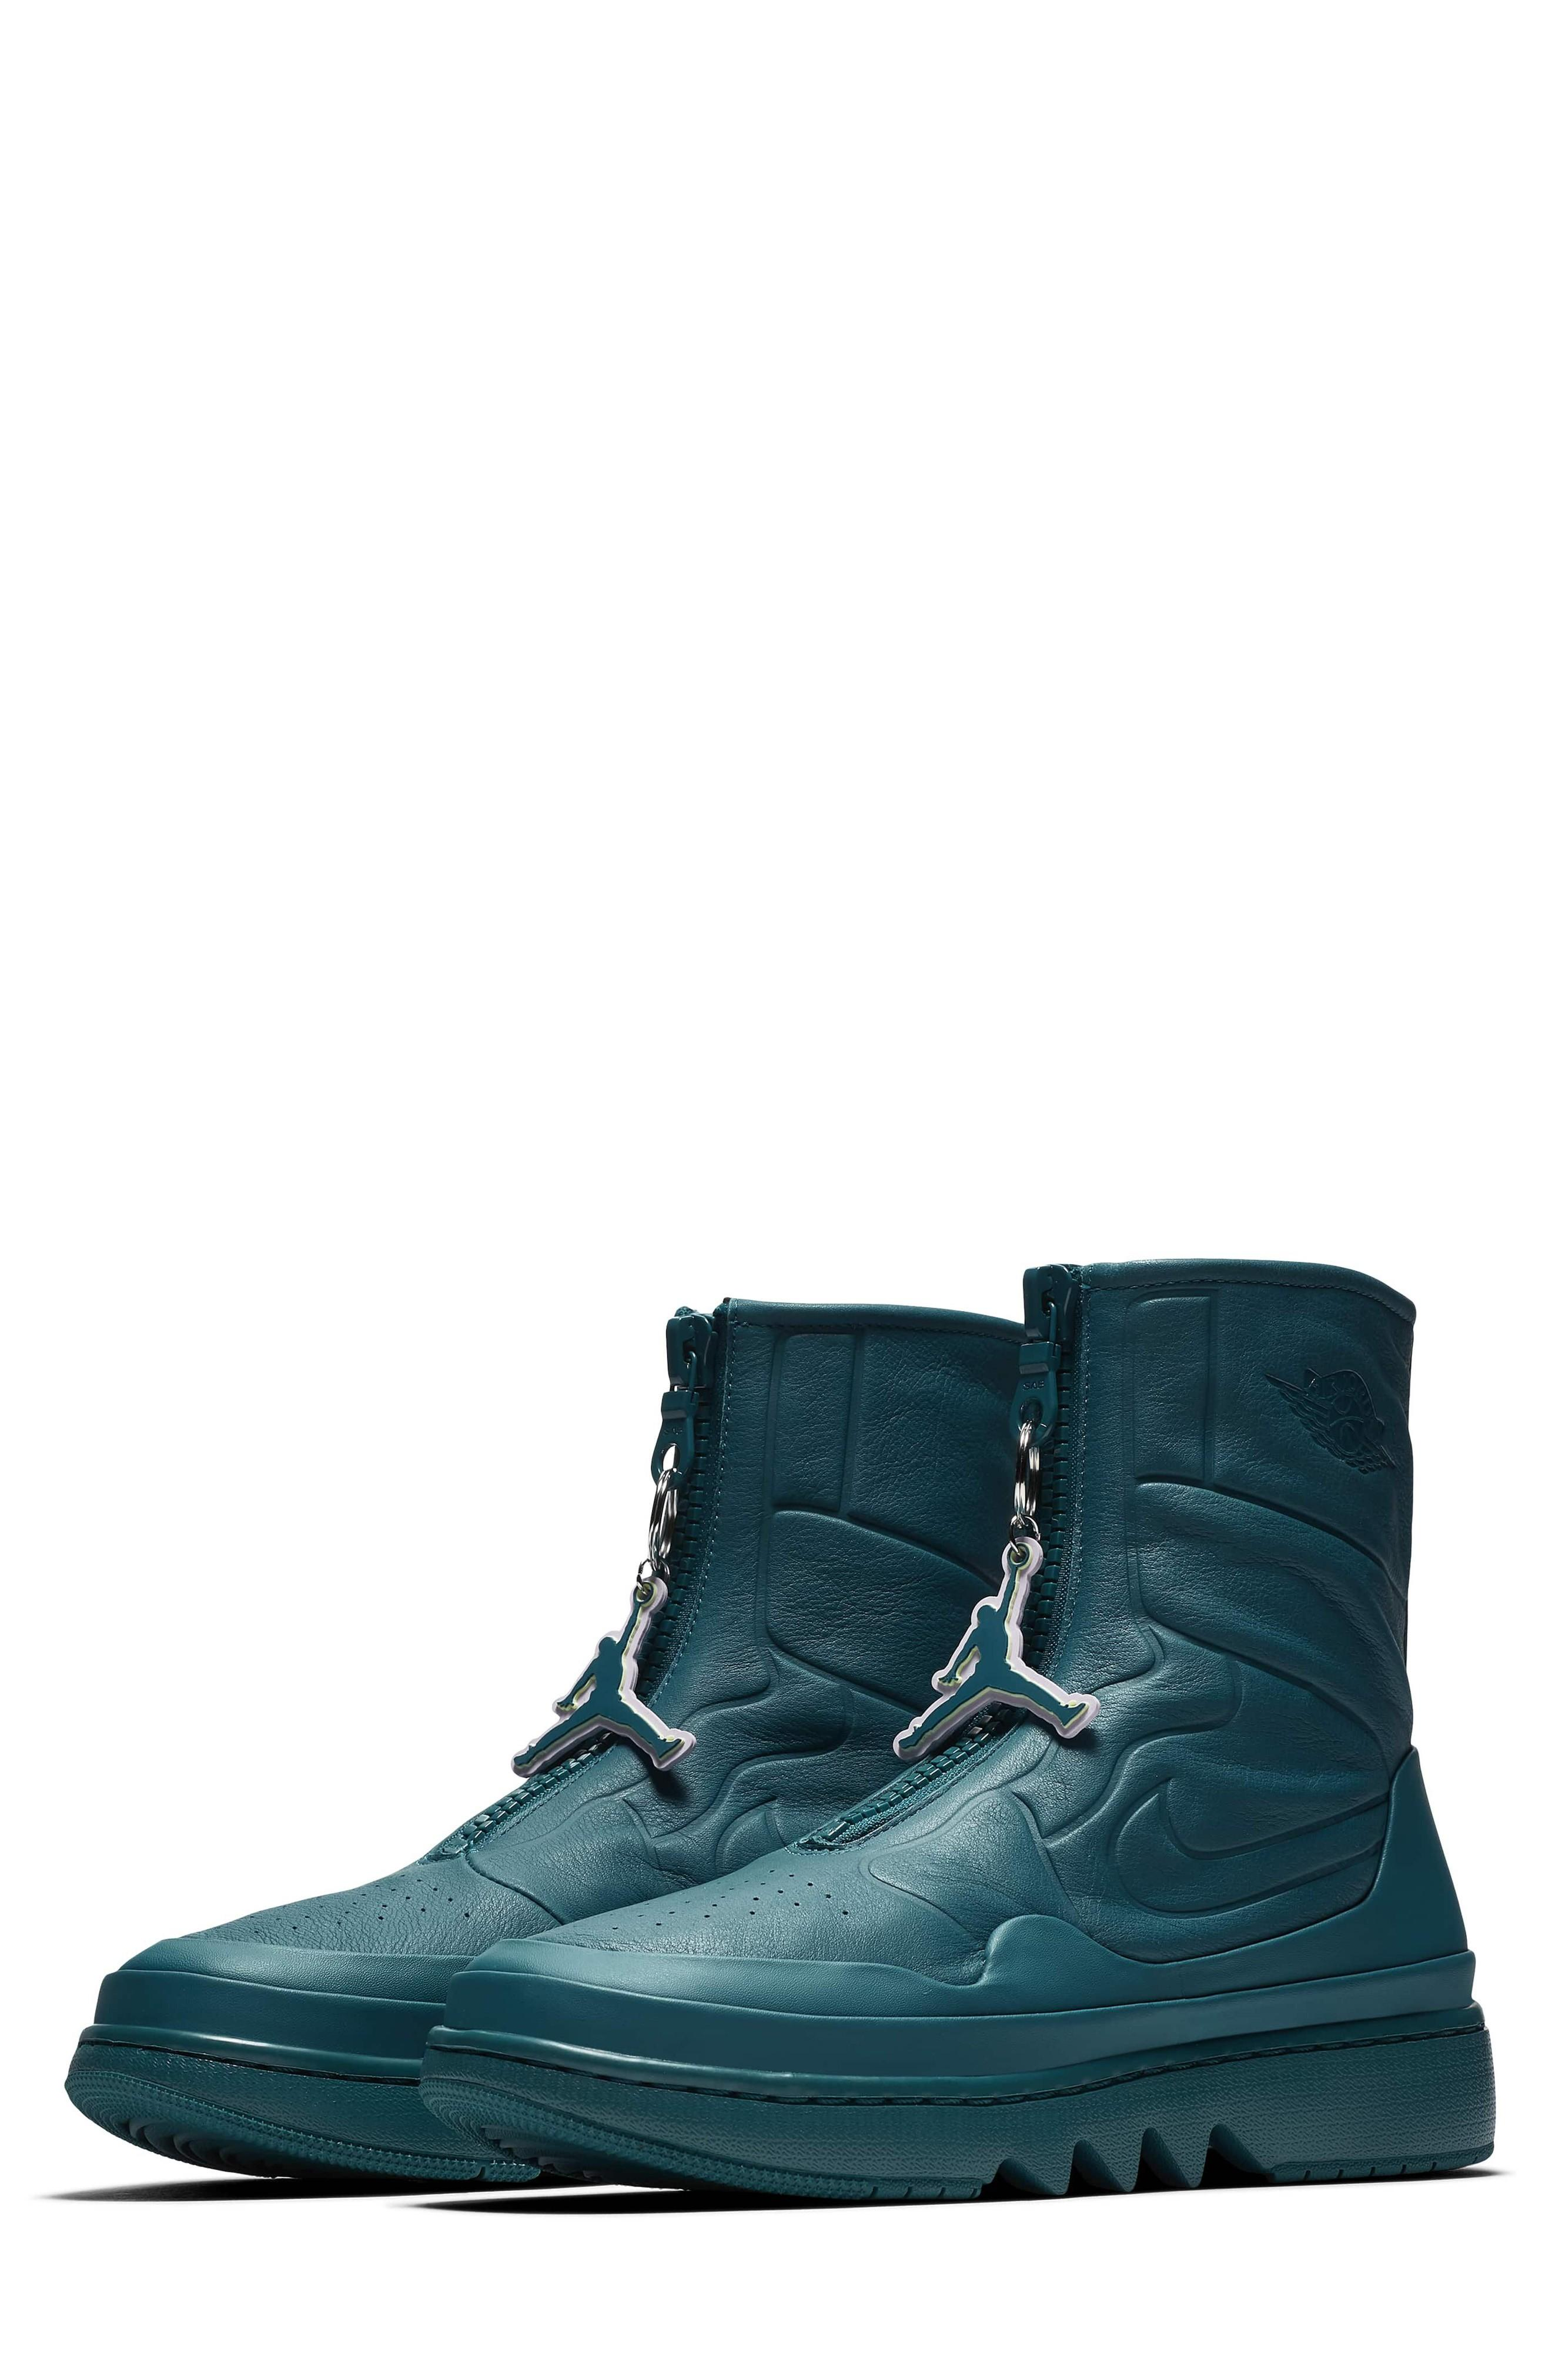 new product 42768 ea857 Nike Air Jordan 1 Jester Xx High Top Sneakers In Green   ModeSens